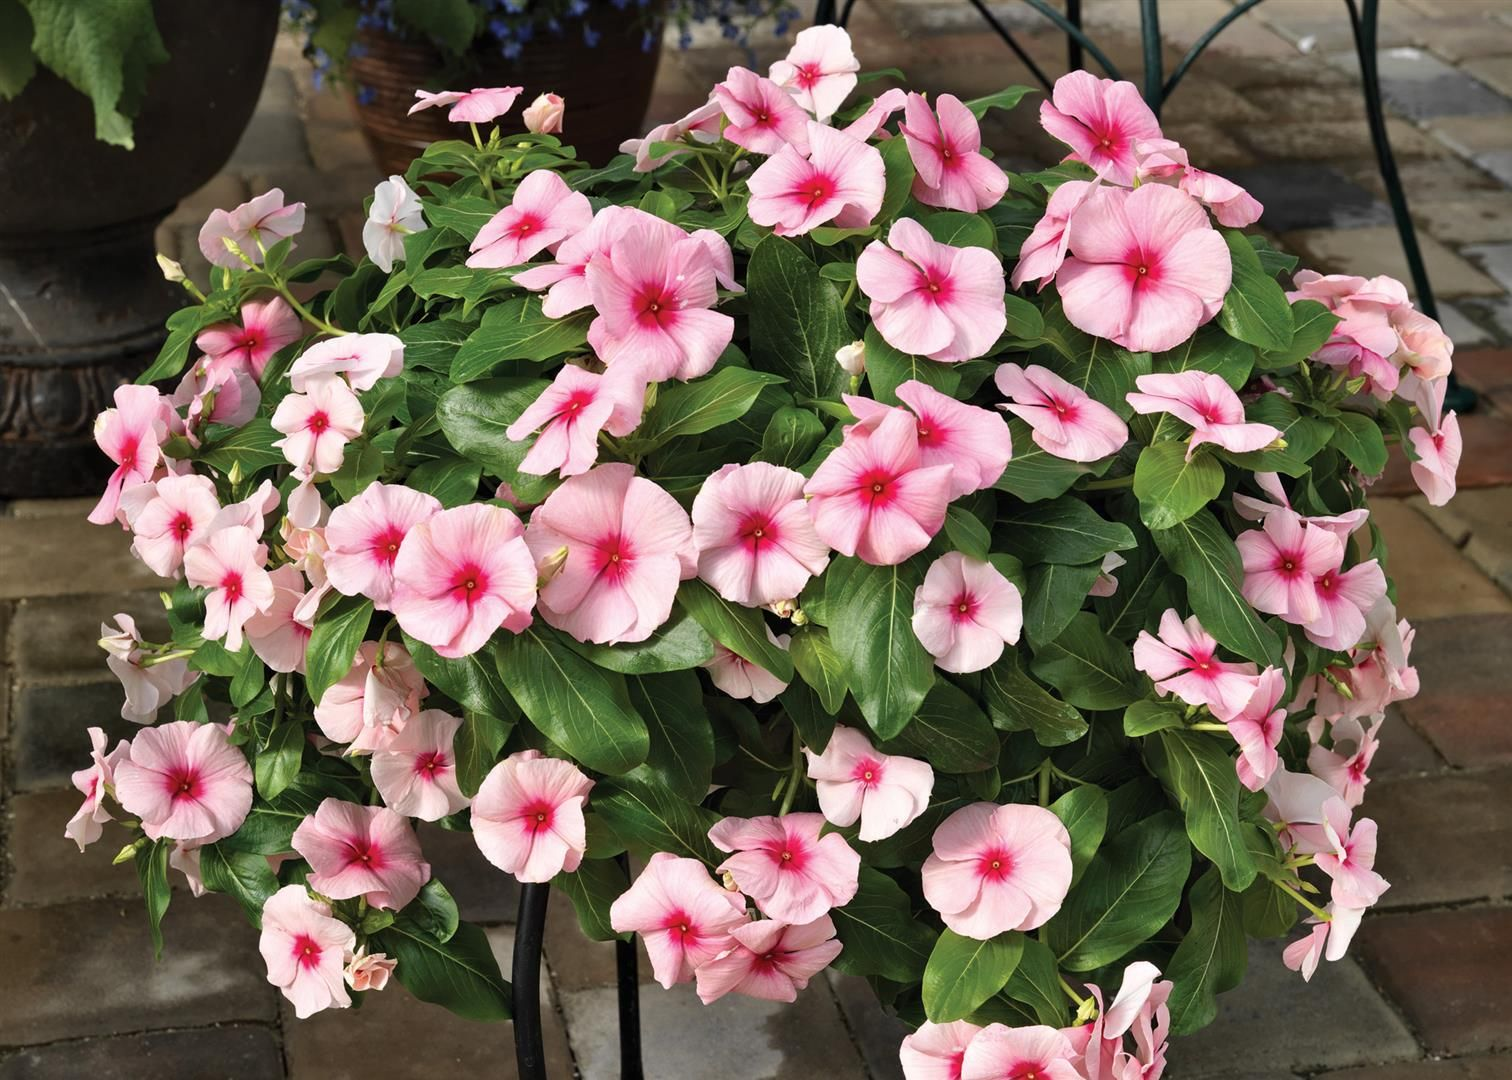 Strawberry Cascade Vinca Google Search Vinca Annual Flowers